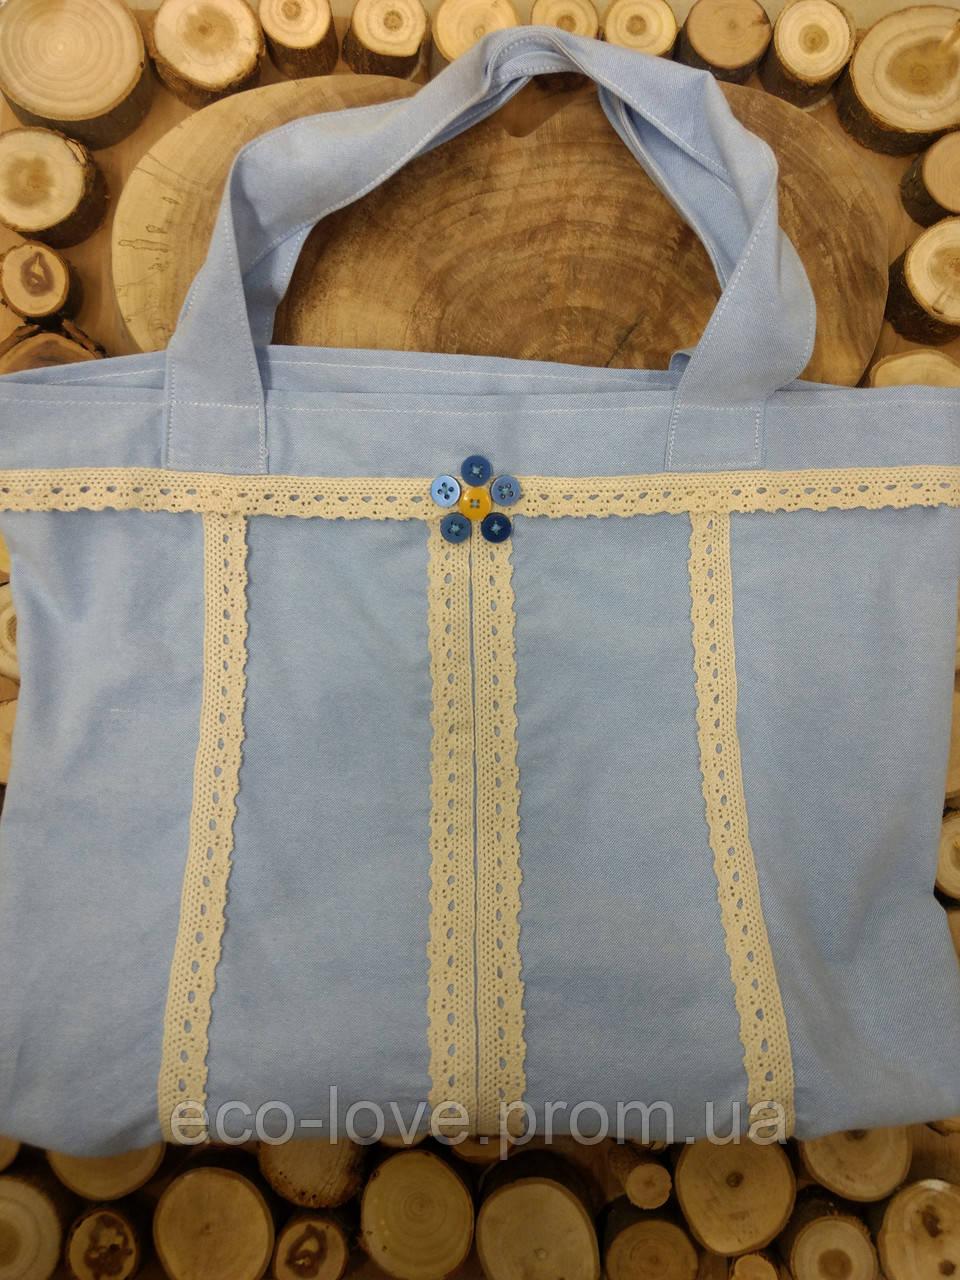 Еко-сумка. Сумка для покупок, шоппер, авоська, торба. Сумка блакитна. Тканинна сумка.